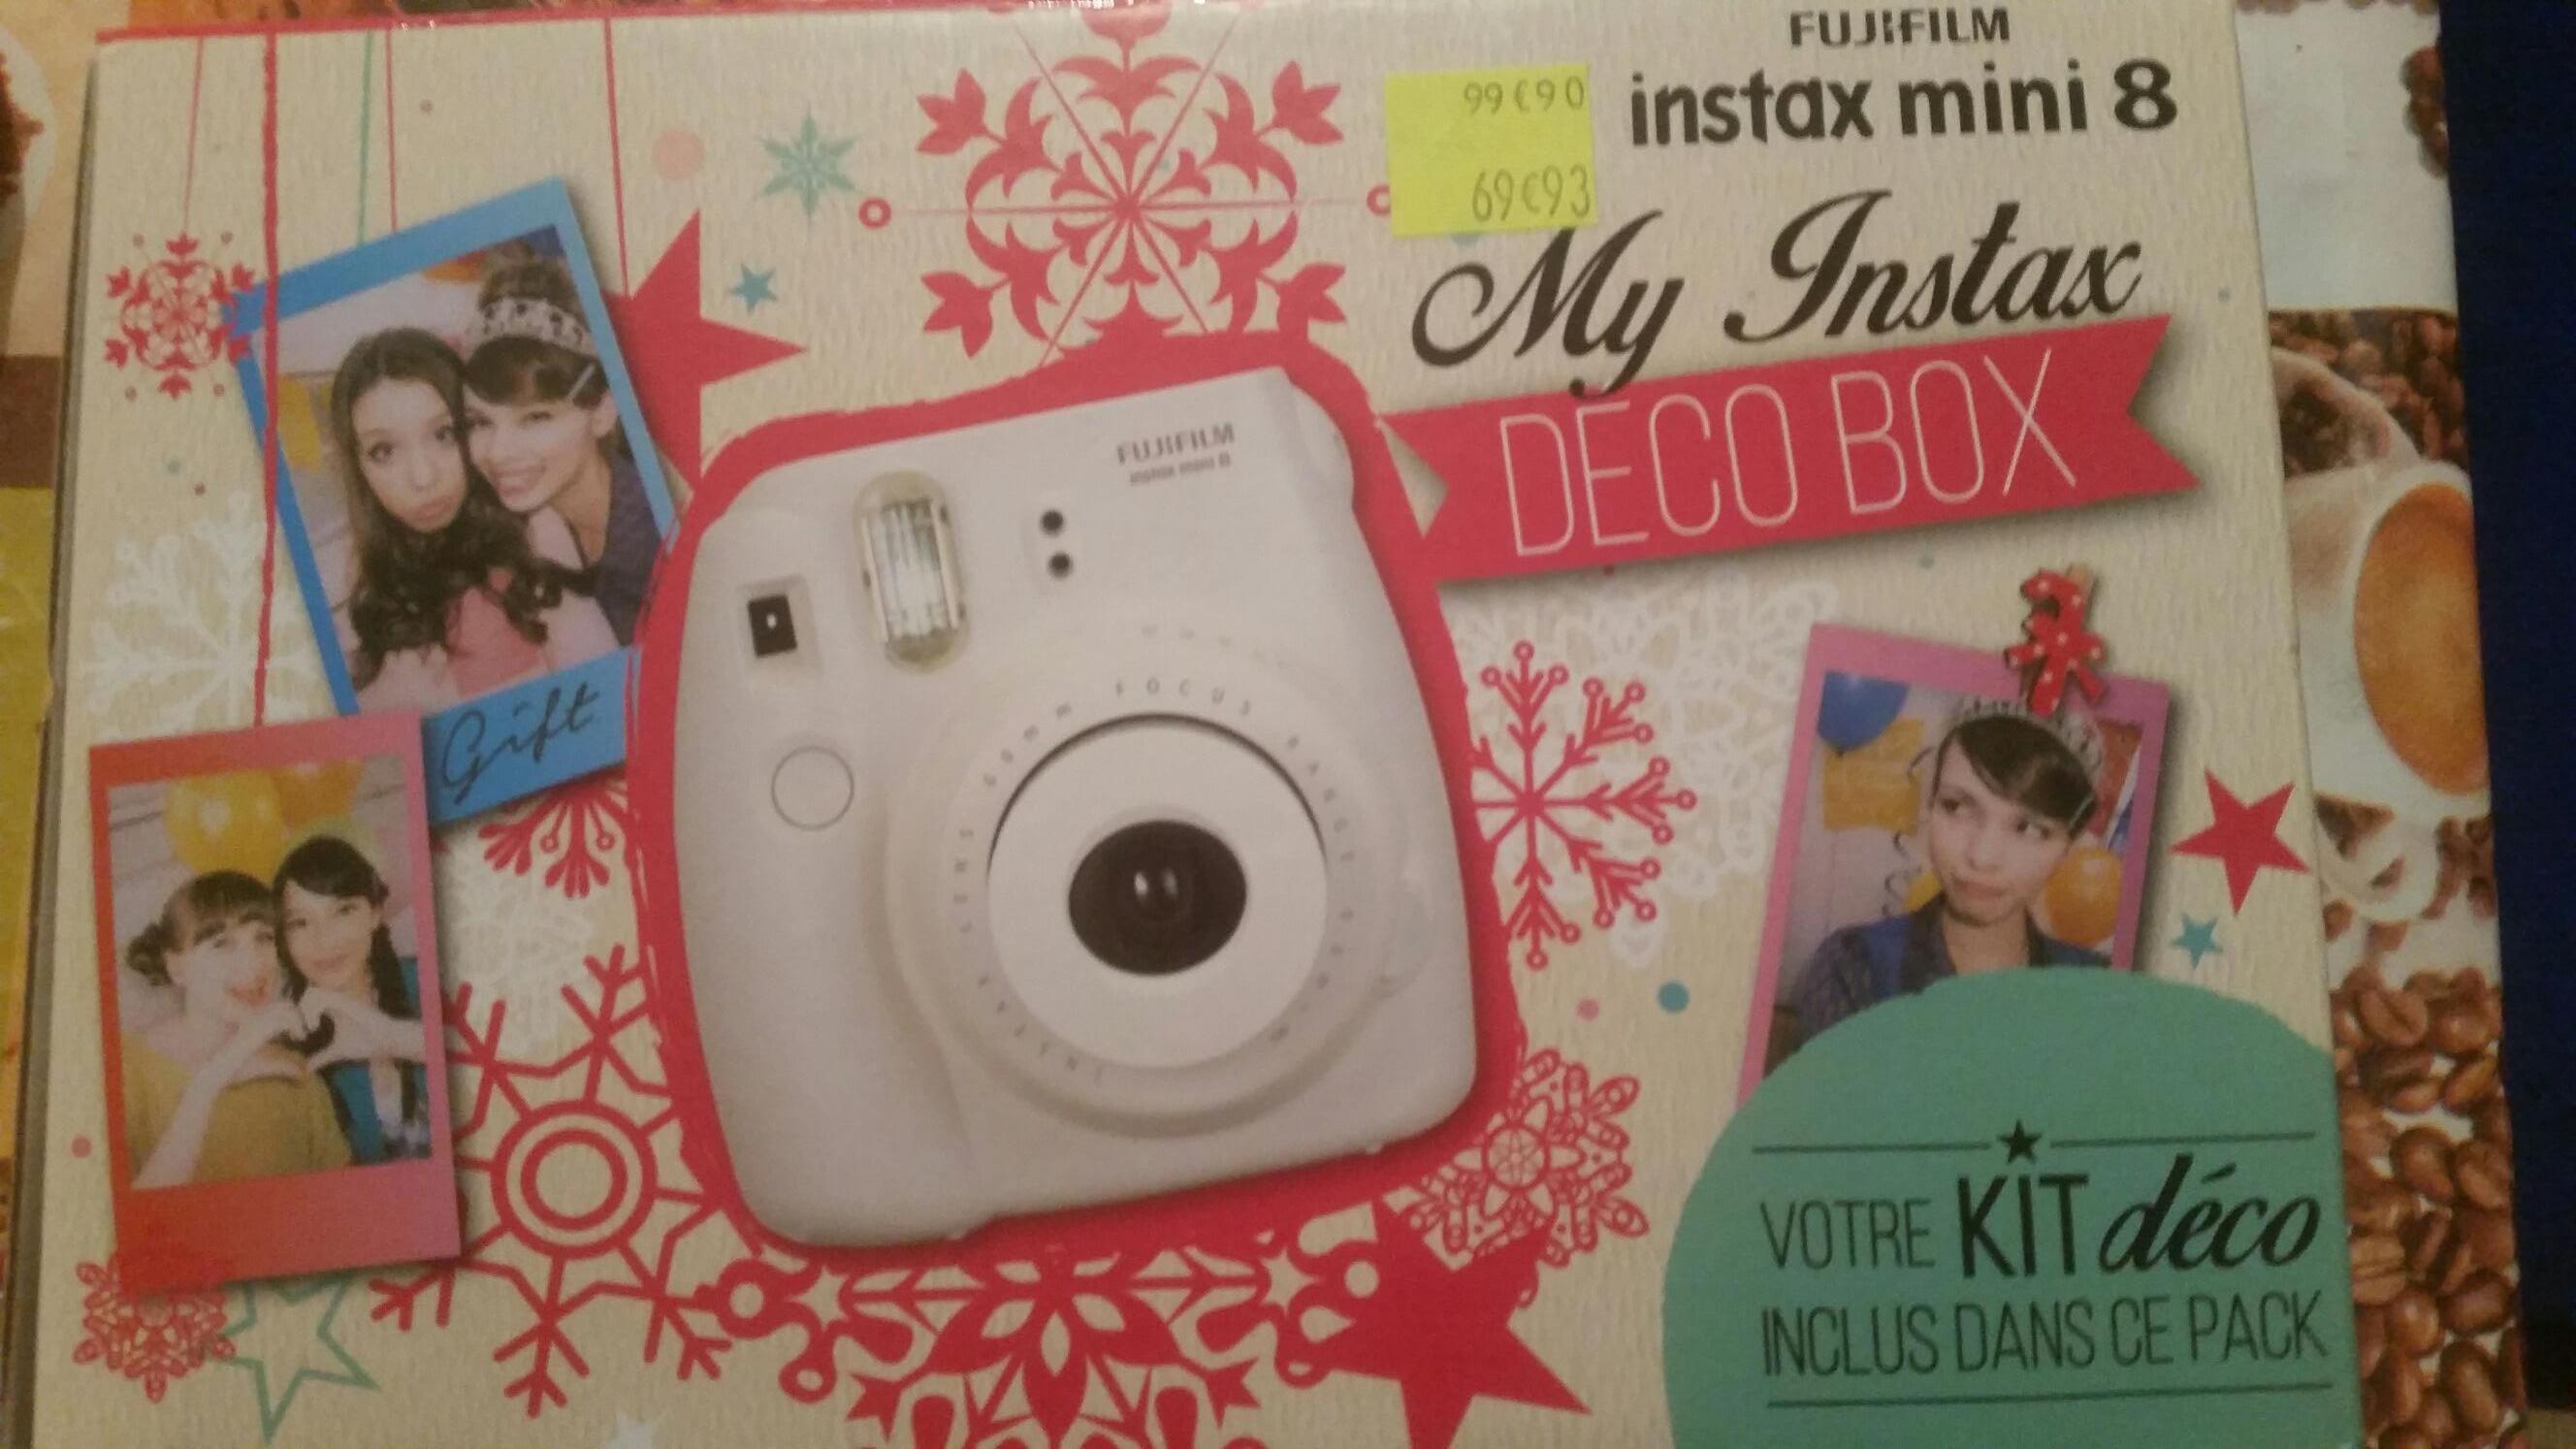 Pack appareil photo instantané Fujifilm Instax Mini 8 + accessoires (My Instax Deco Box)